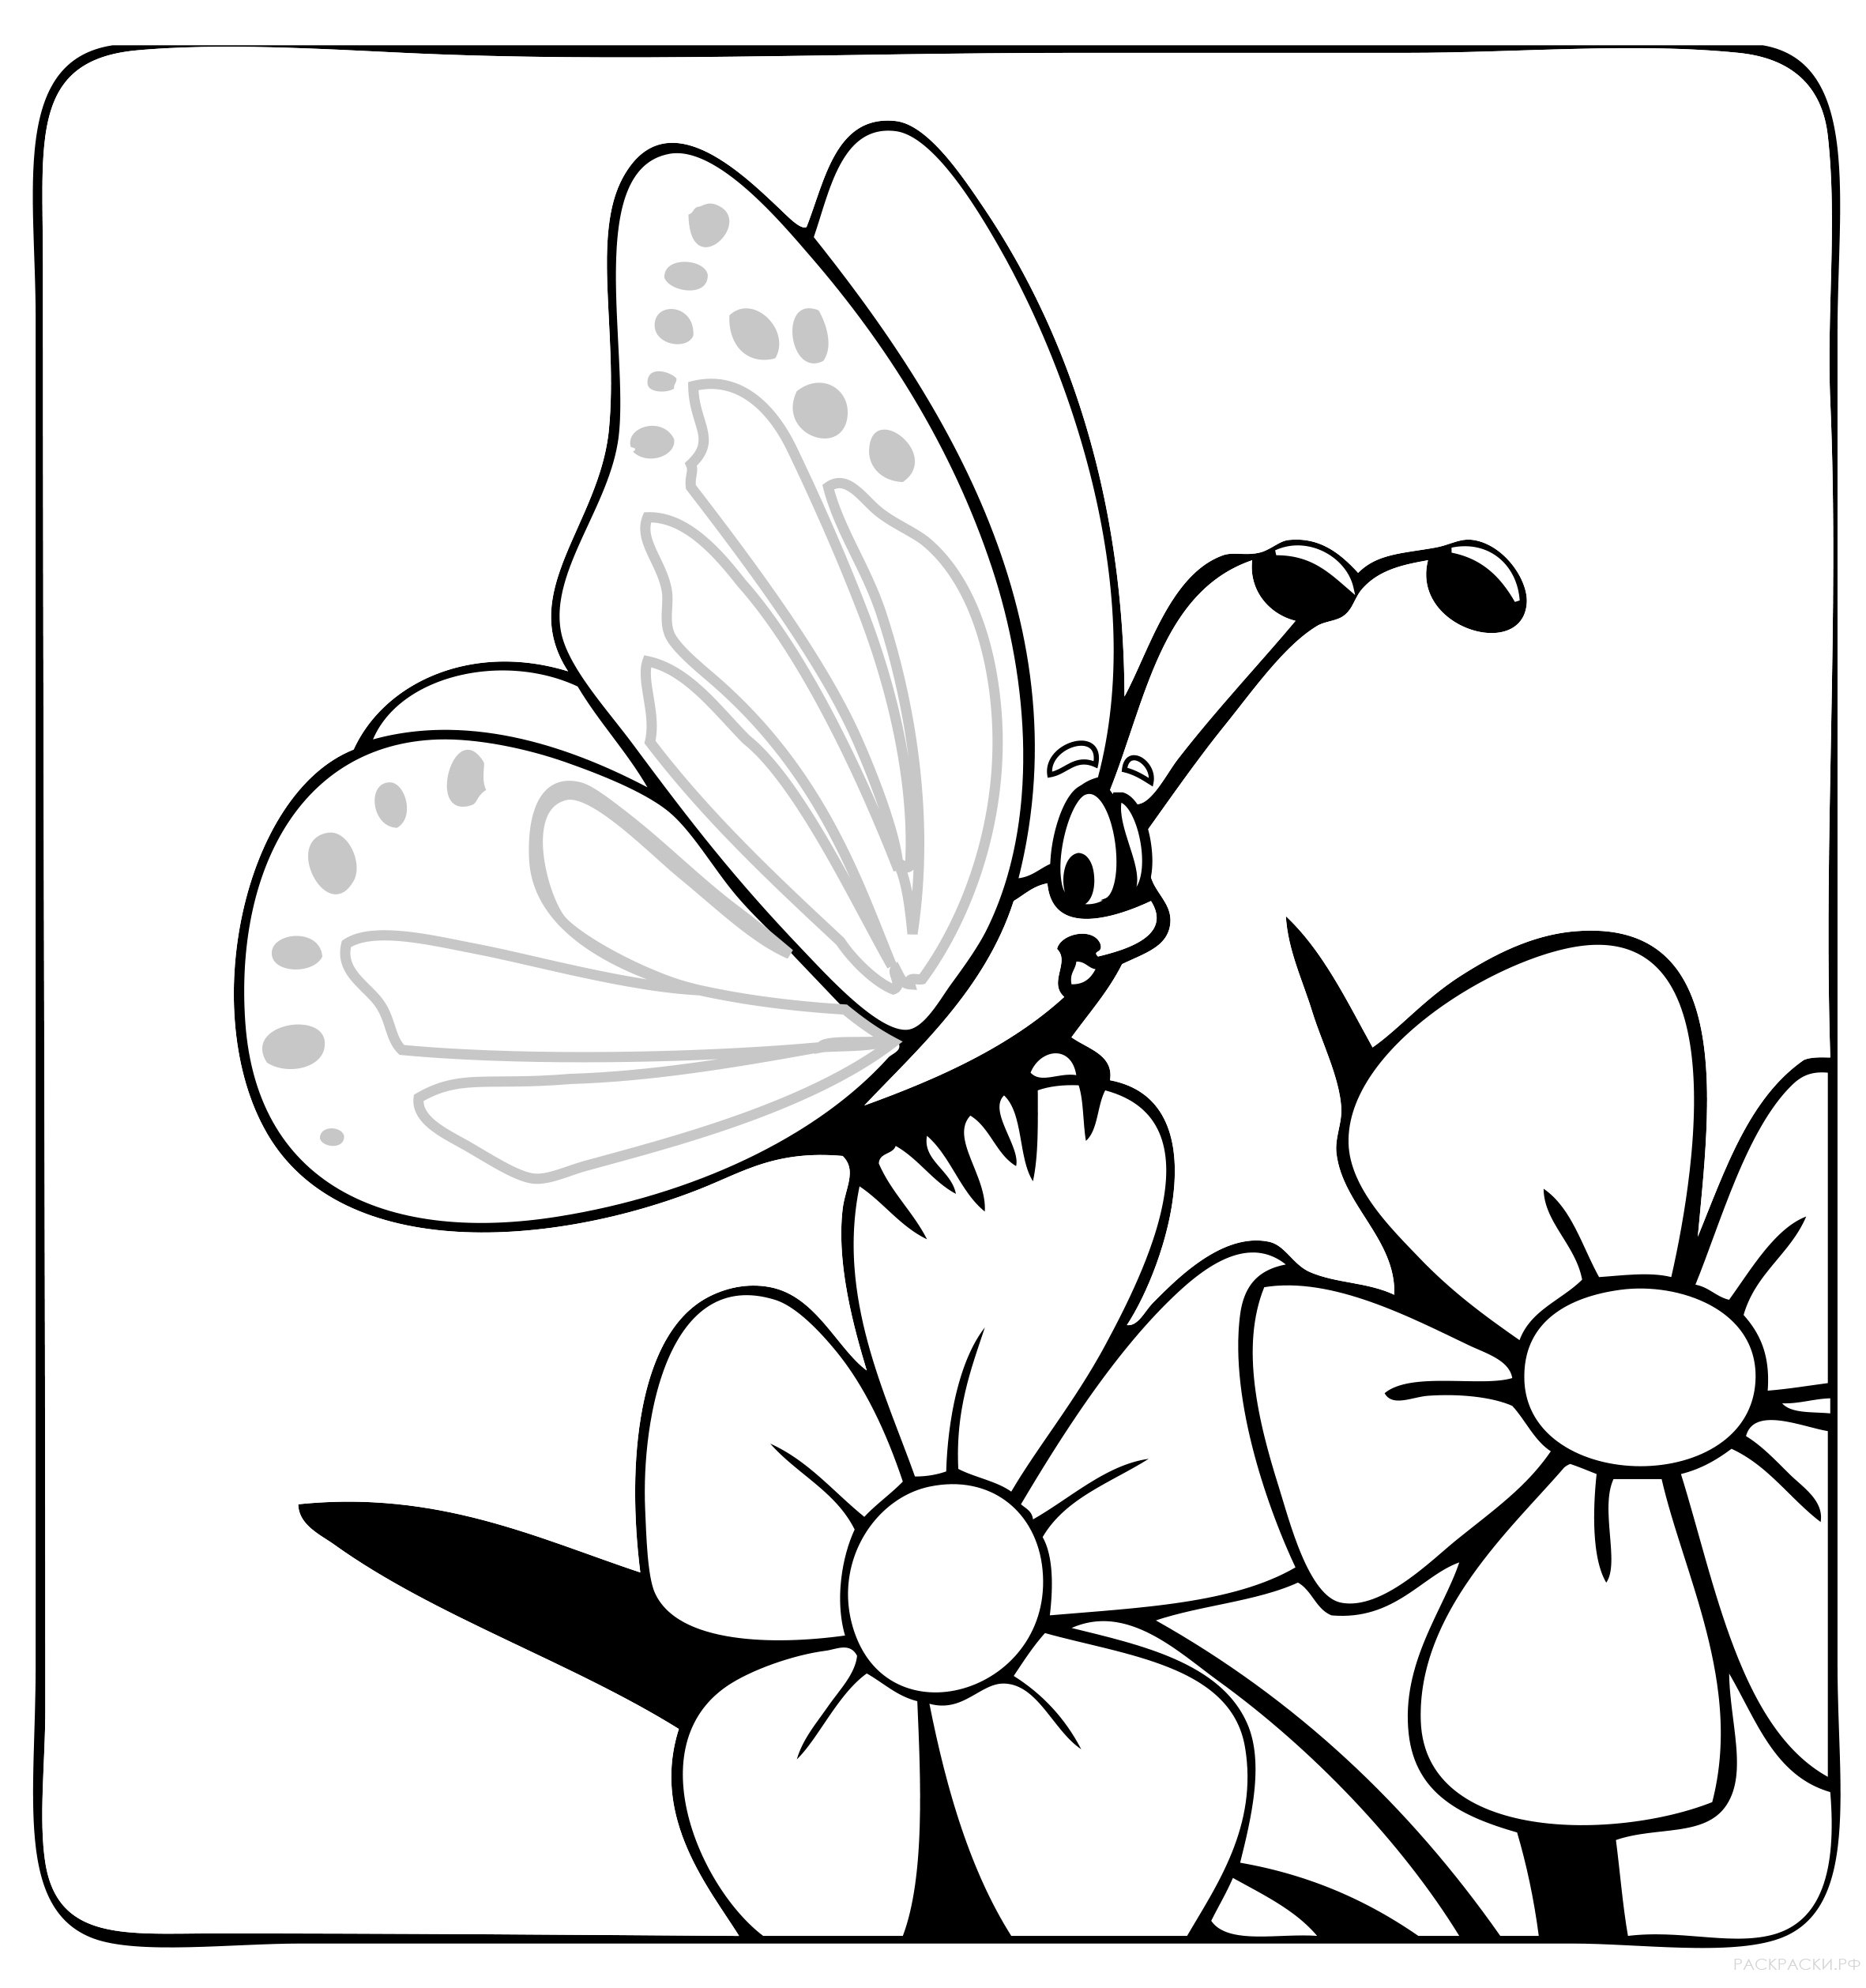 Раскраска Бабочка и цветы